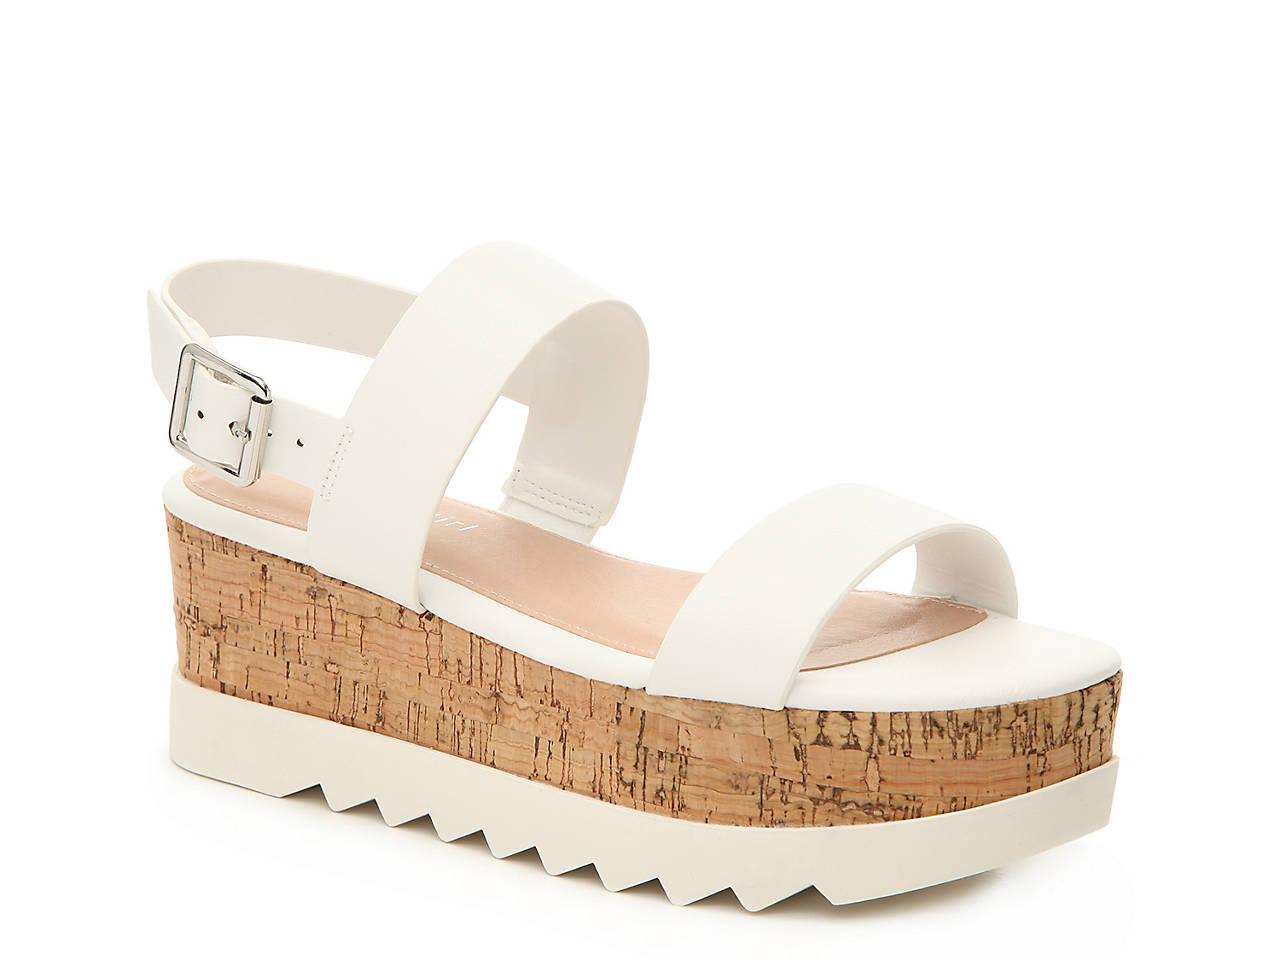 4f79fbebc497 Madden Girl Sweet Wedge Sandal Women s Shoes